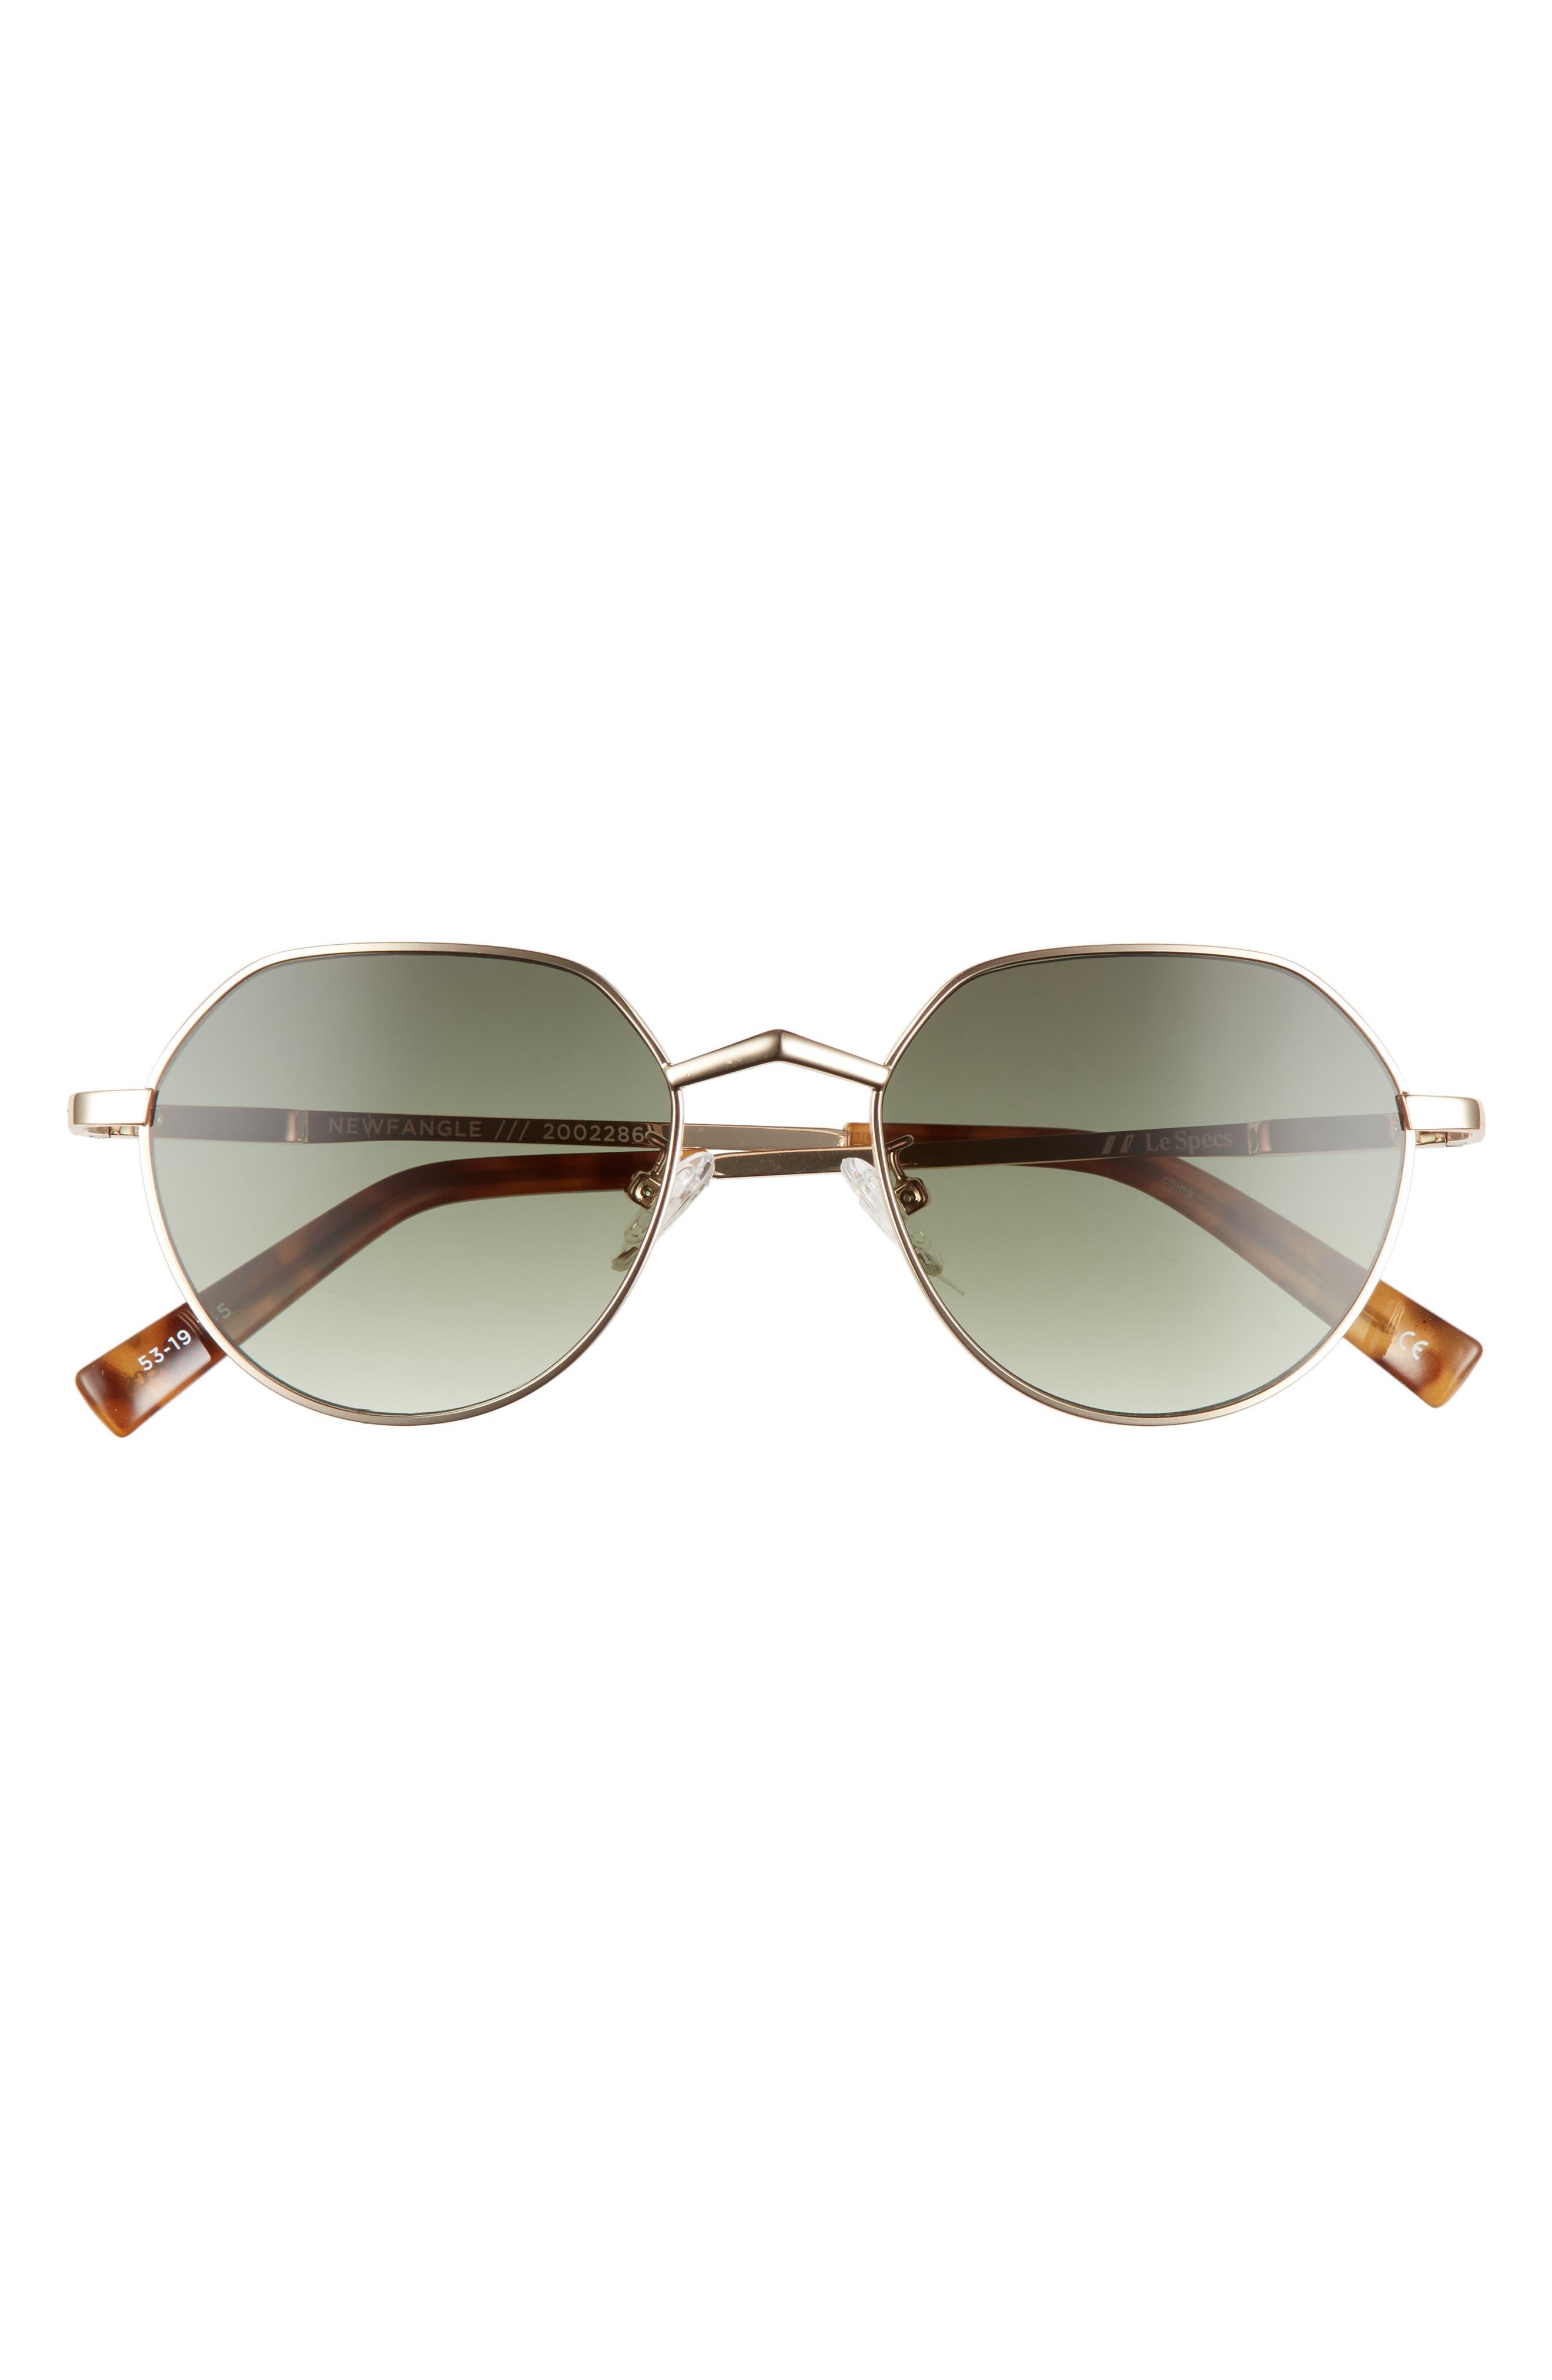 Newfangle Found 53mm Sunglasses